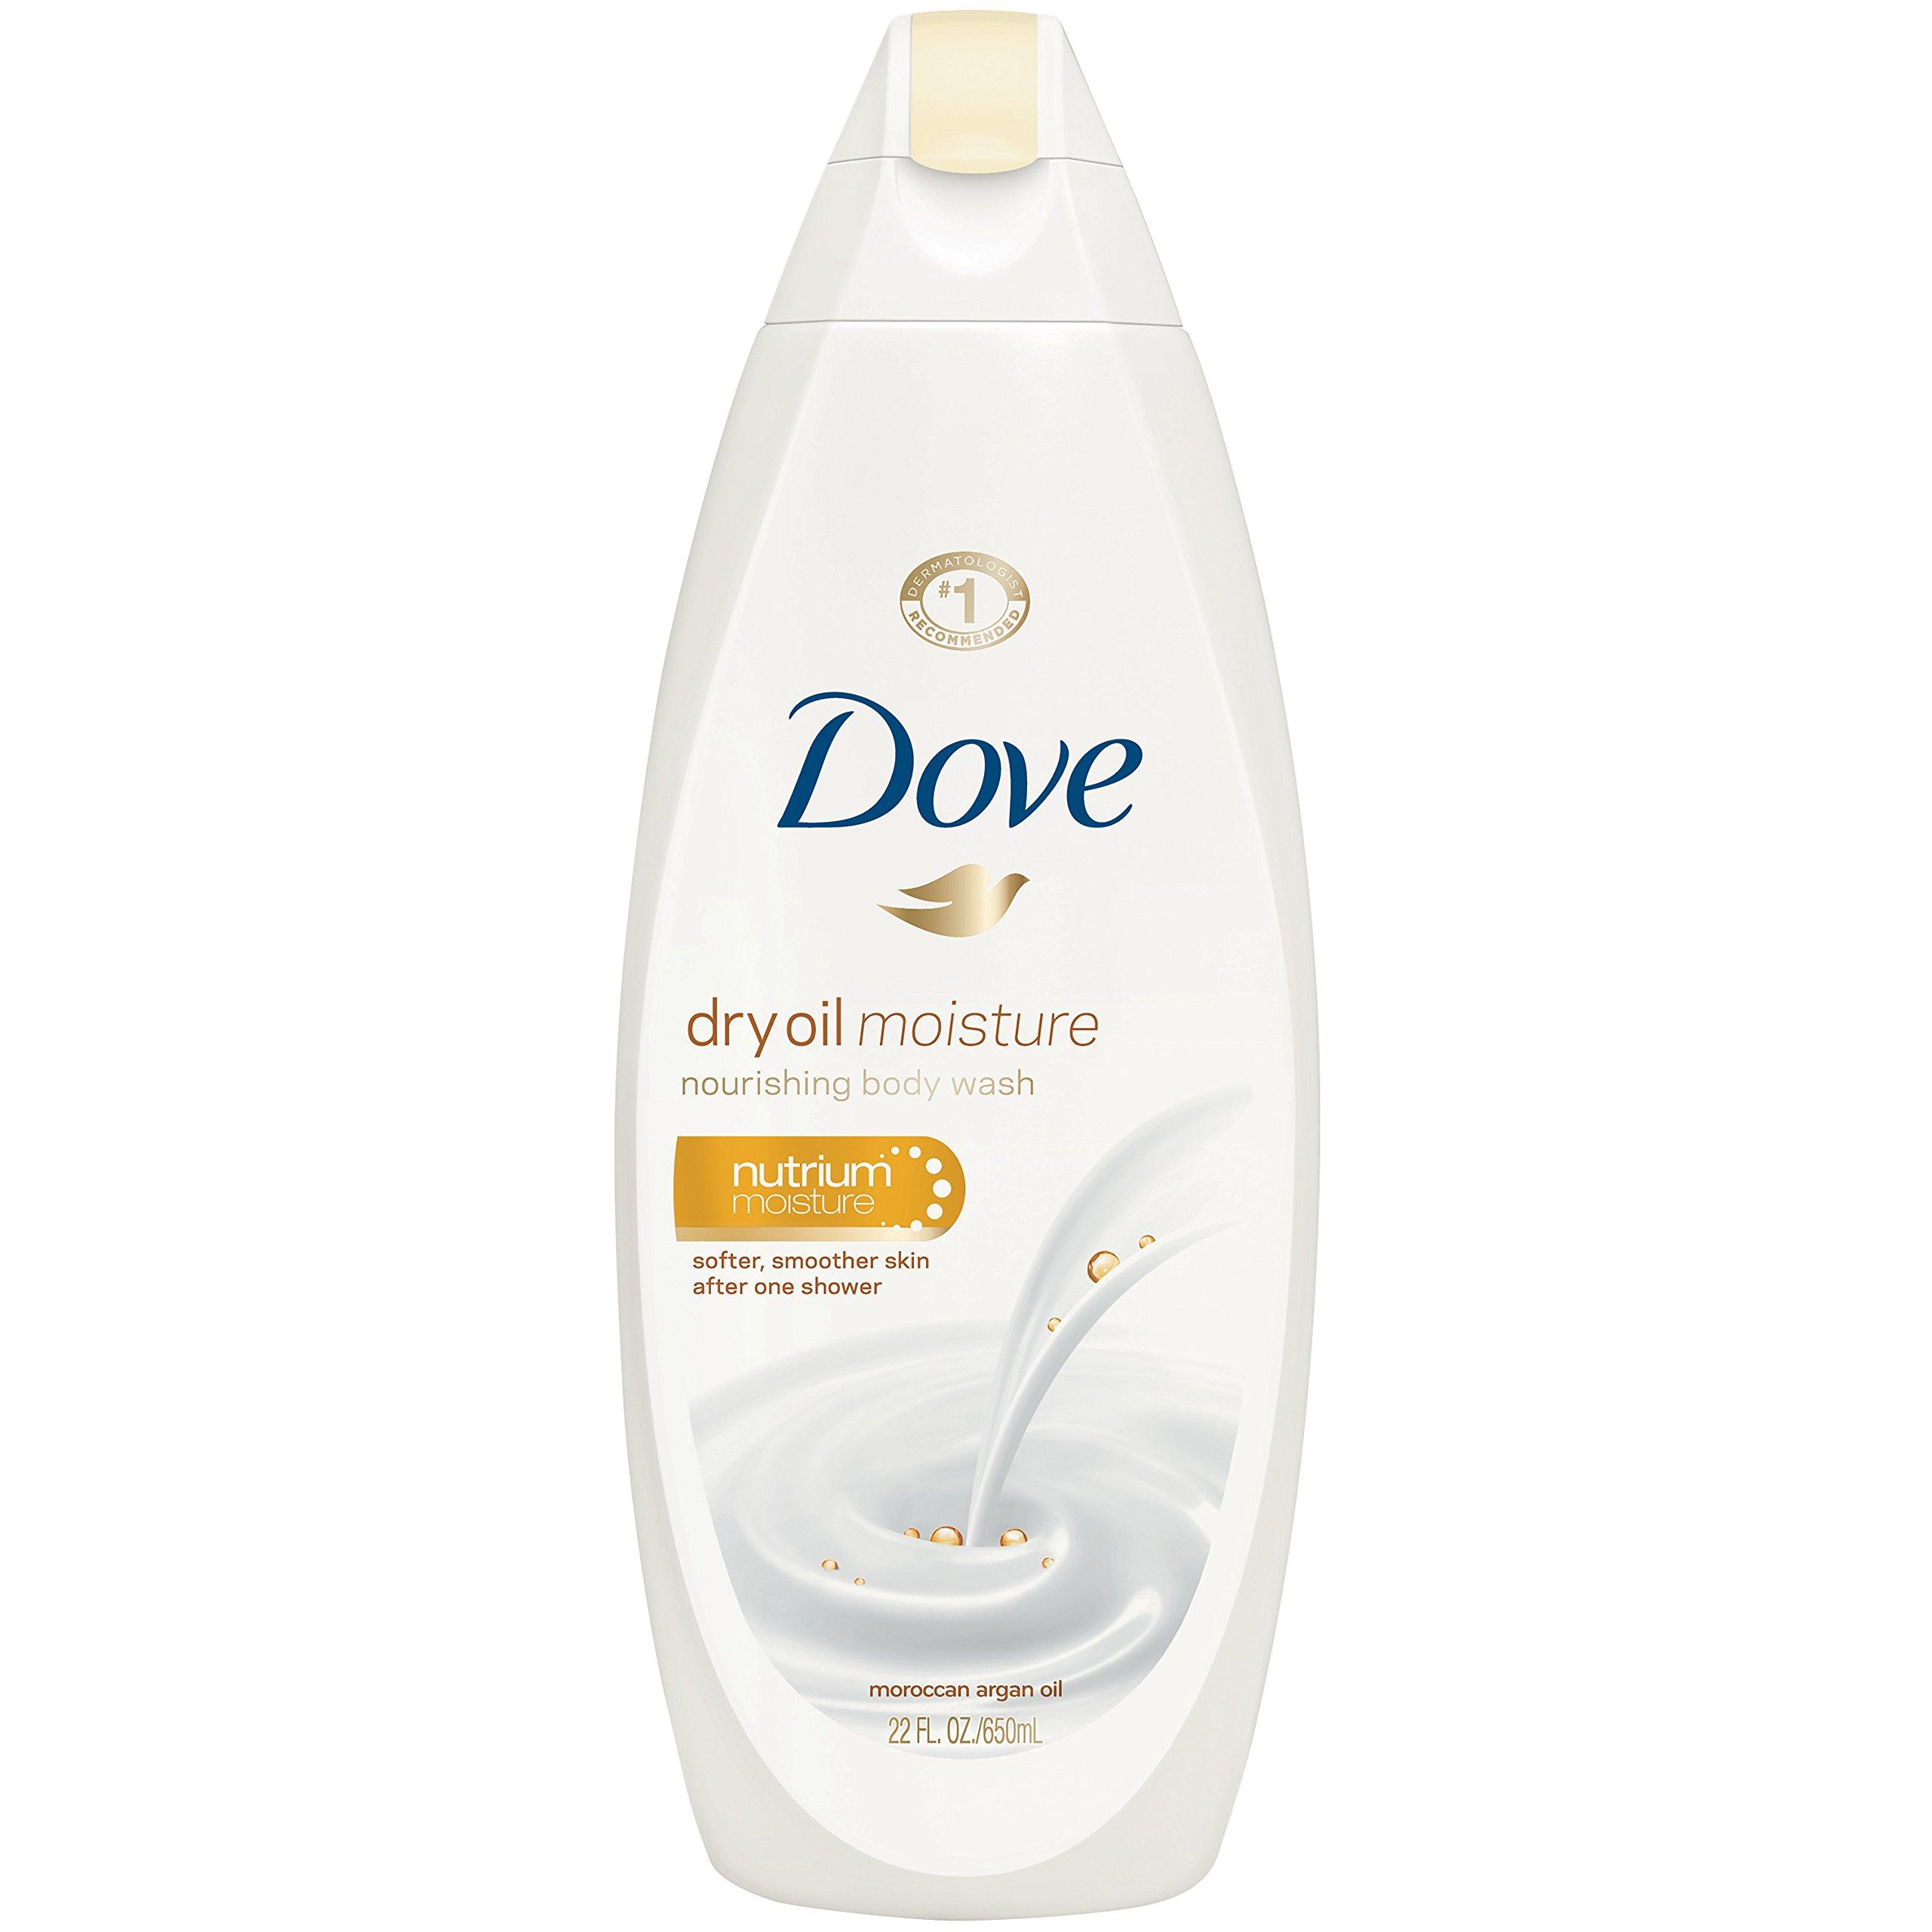 Dove Body Wash, Dry Oil Moisture 22 oz